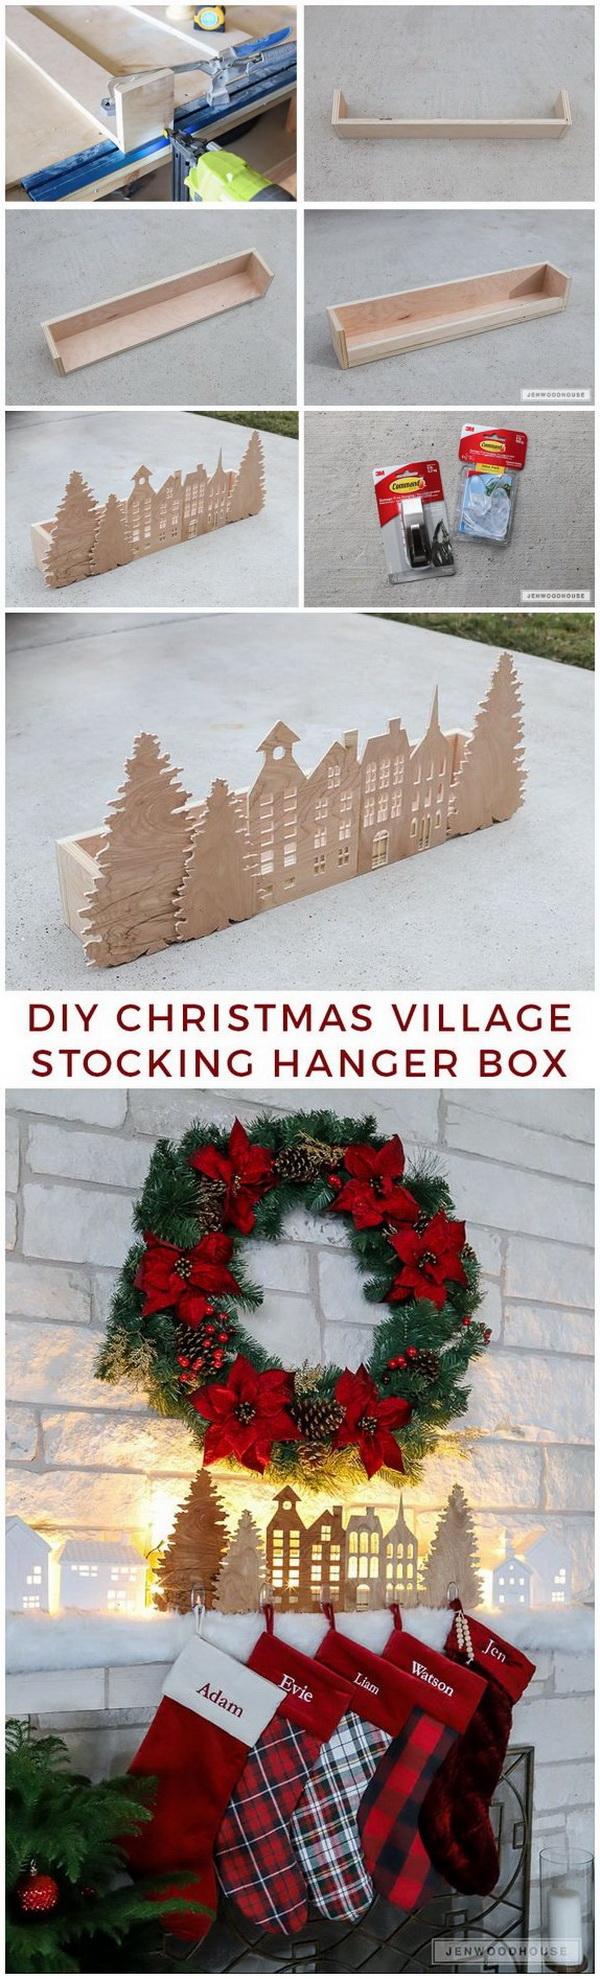 Christmas Village Stocking Hanger Box.